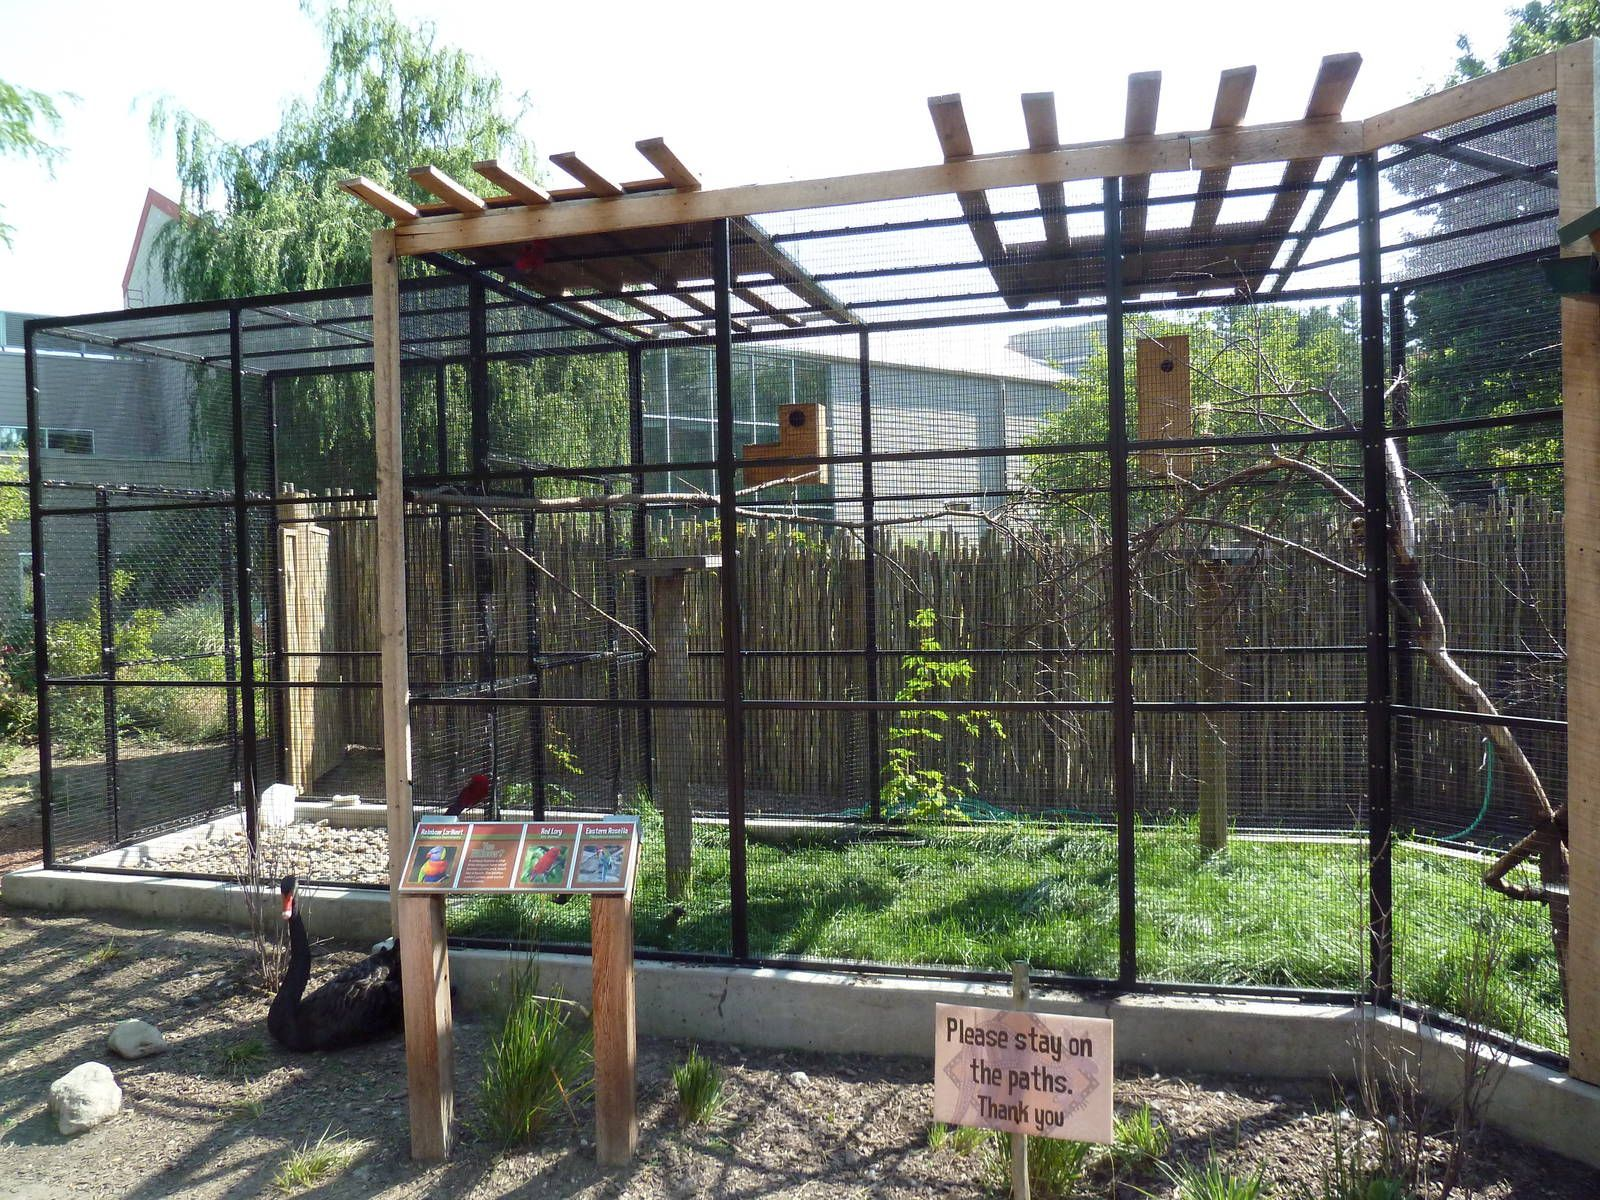 Australia Adventure Bird Aviary 187 Blank Park Zoo Gallery